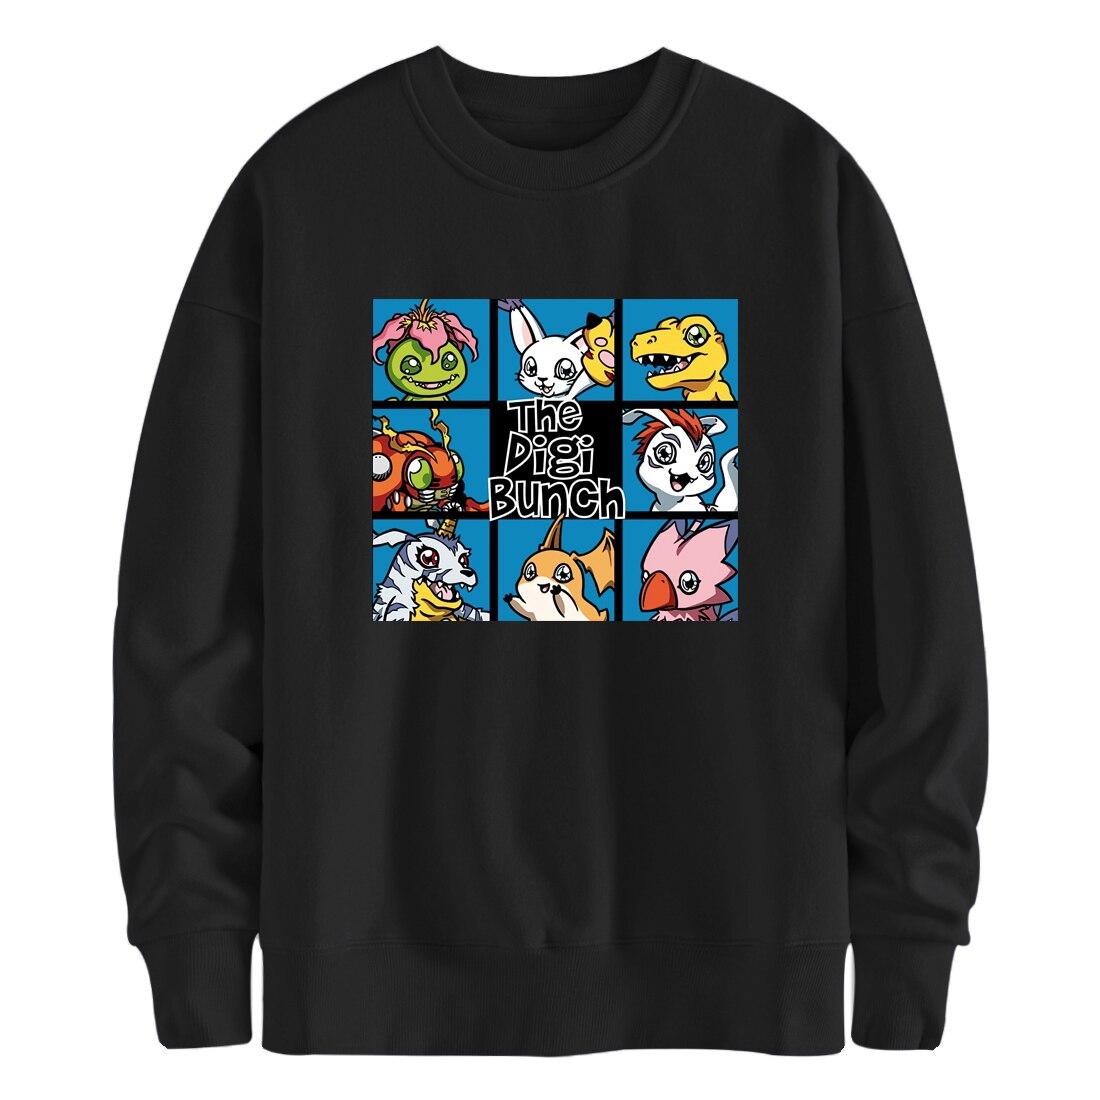 Harajuku Fleece Digimon Hoodies Japan Anime Sweatshirts Men Brand Clothing Streetwear Harajuku Pullovers Moletom Masculino 2021